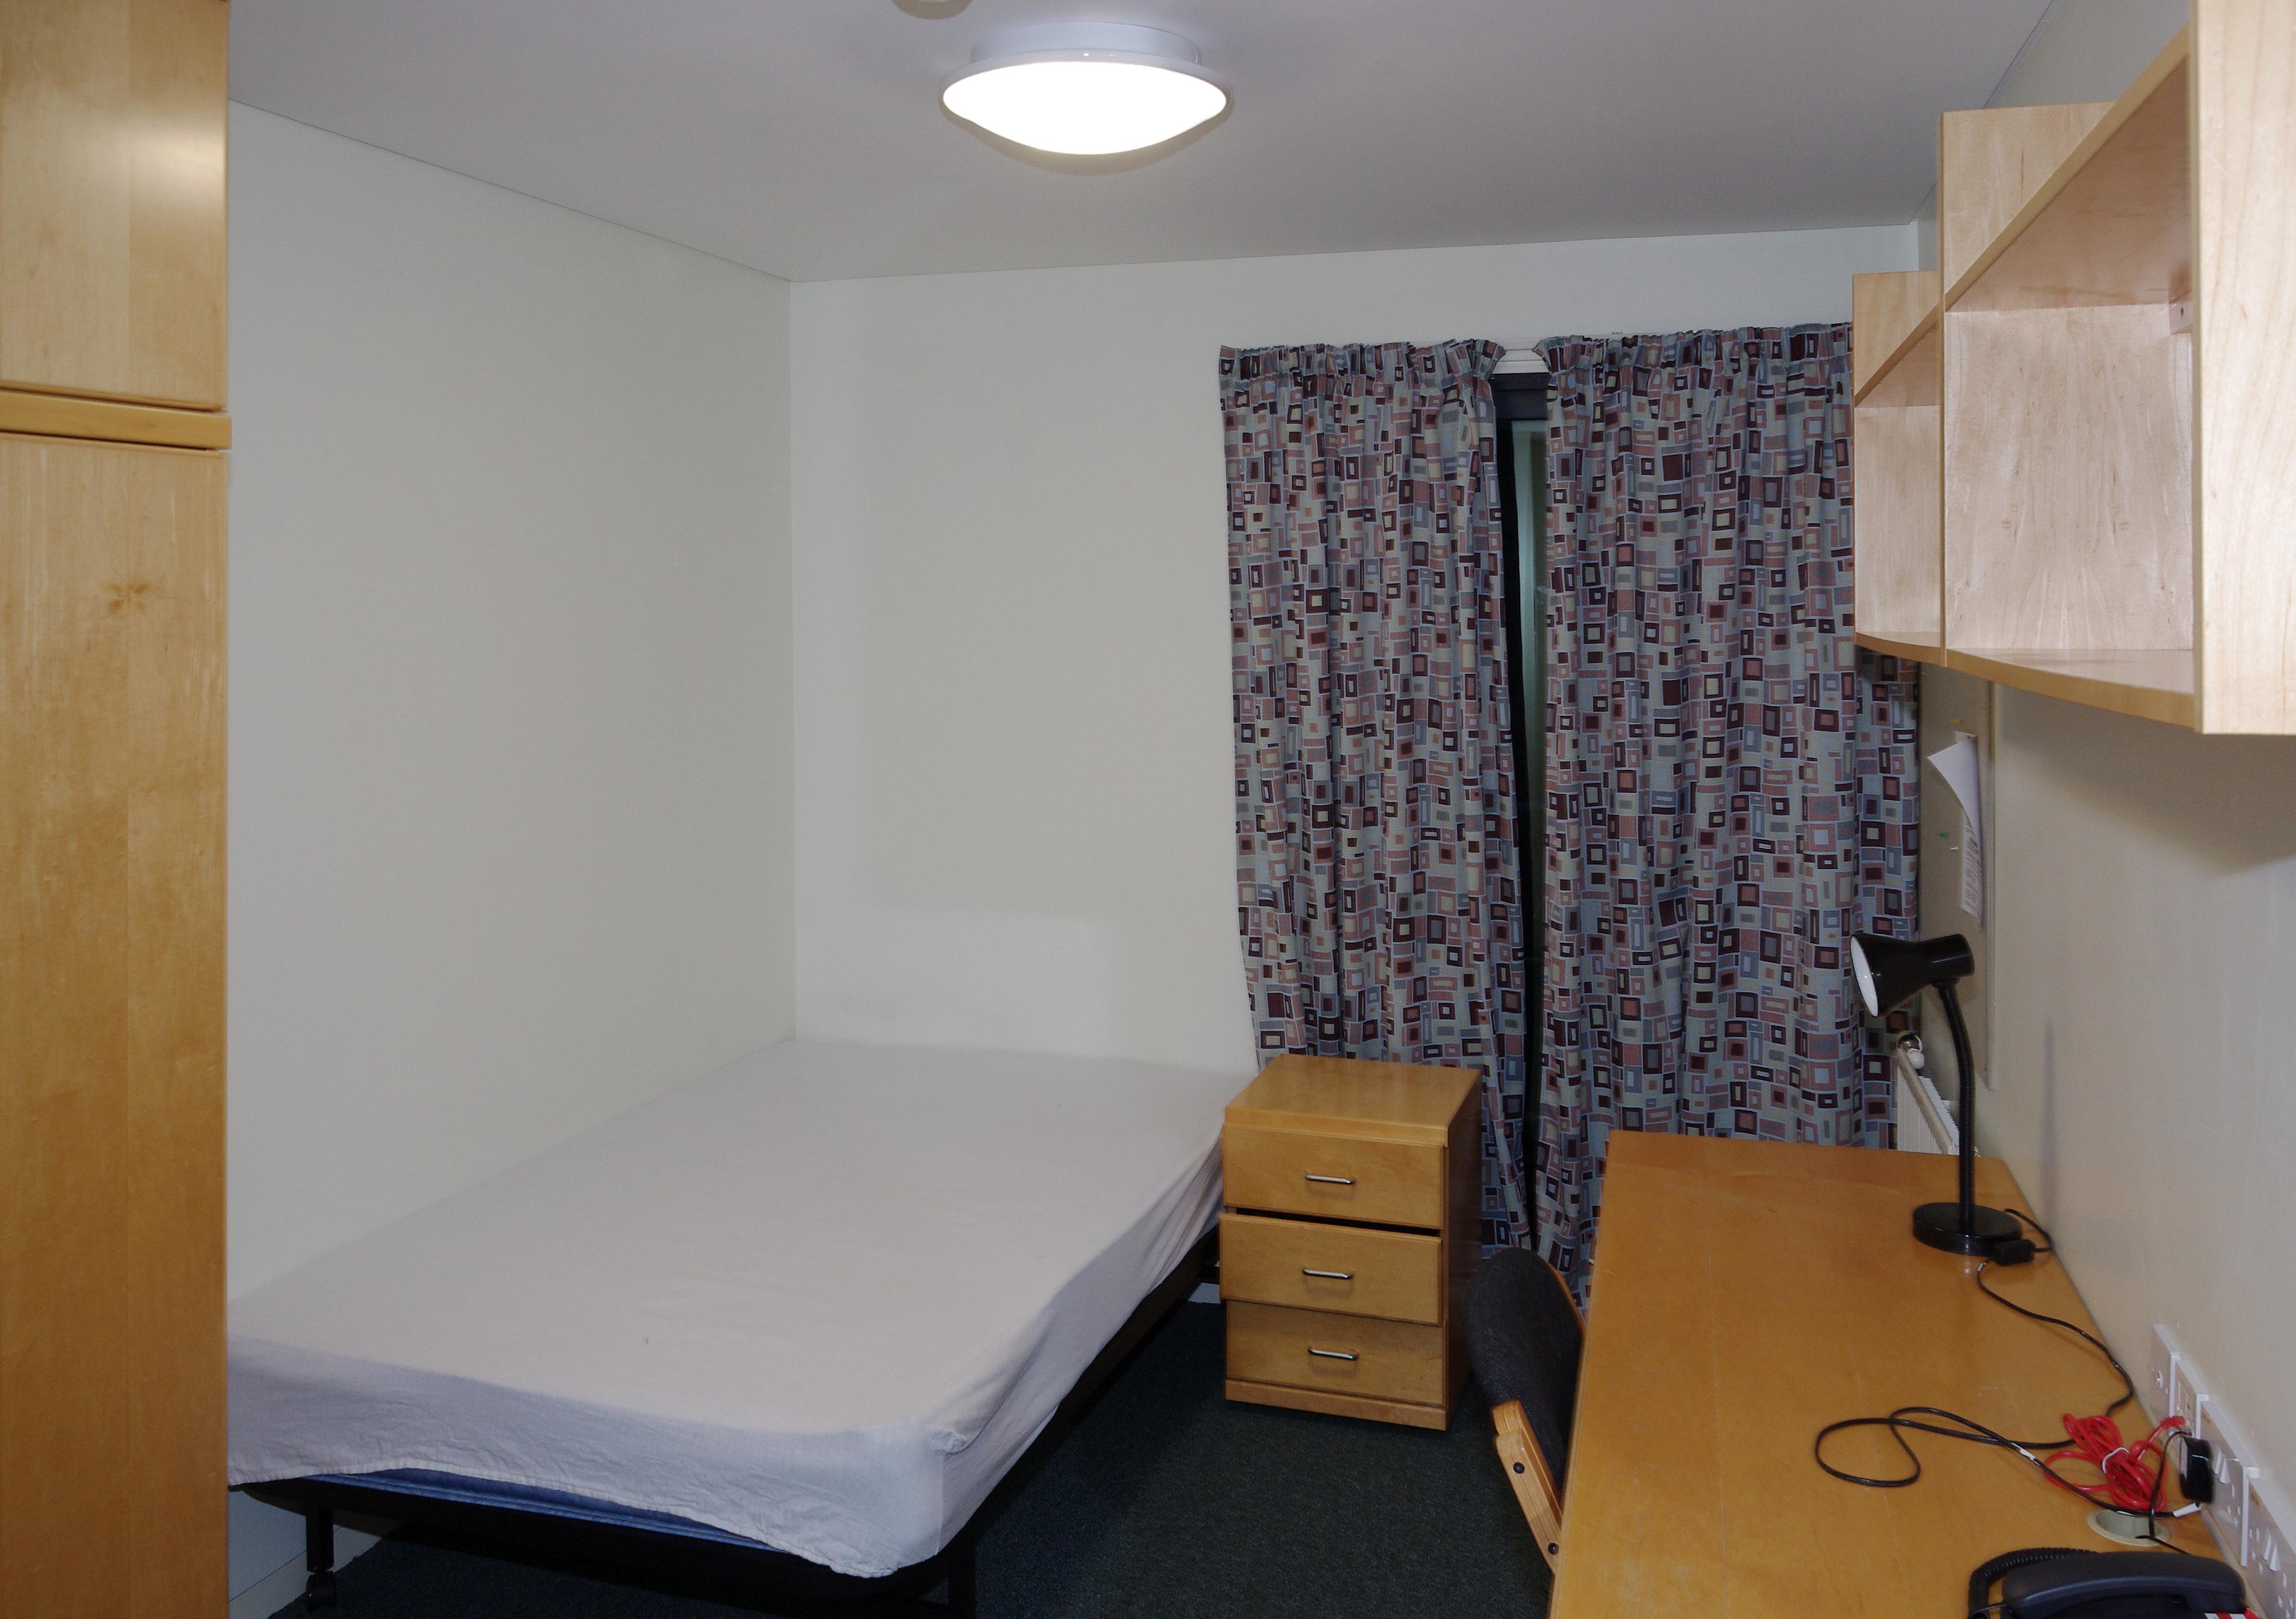 Nottingham University Catered Accommodation Student Room